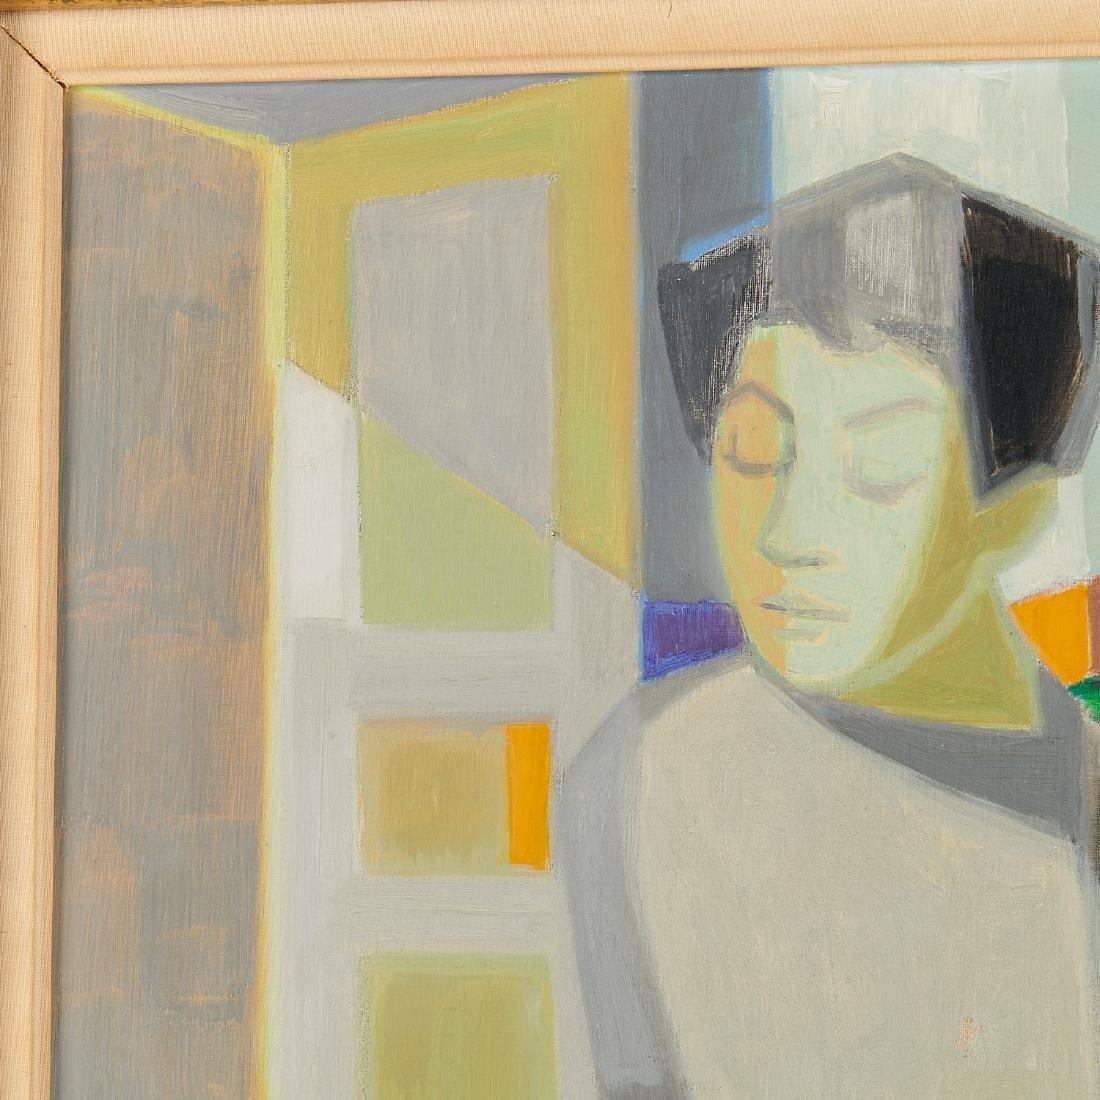 Francois Bret, painting, 1958 - 3